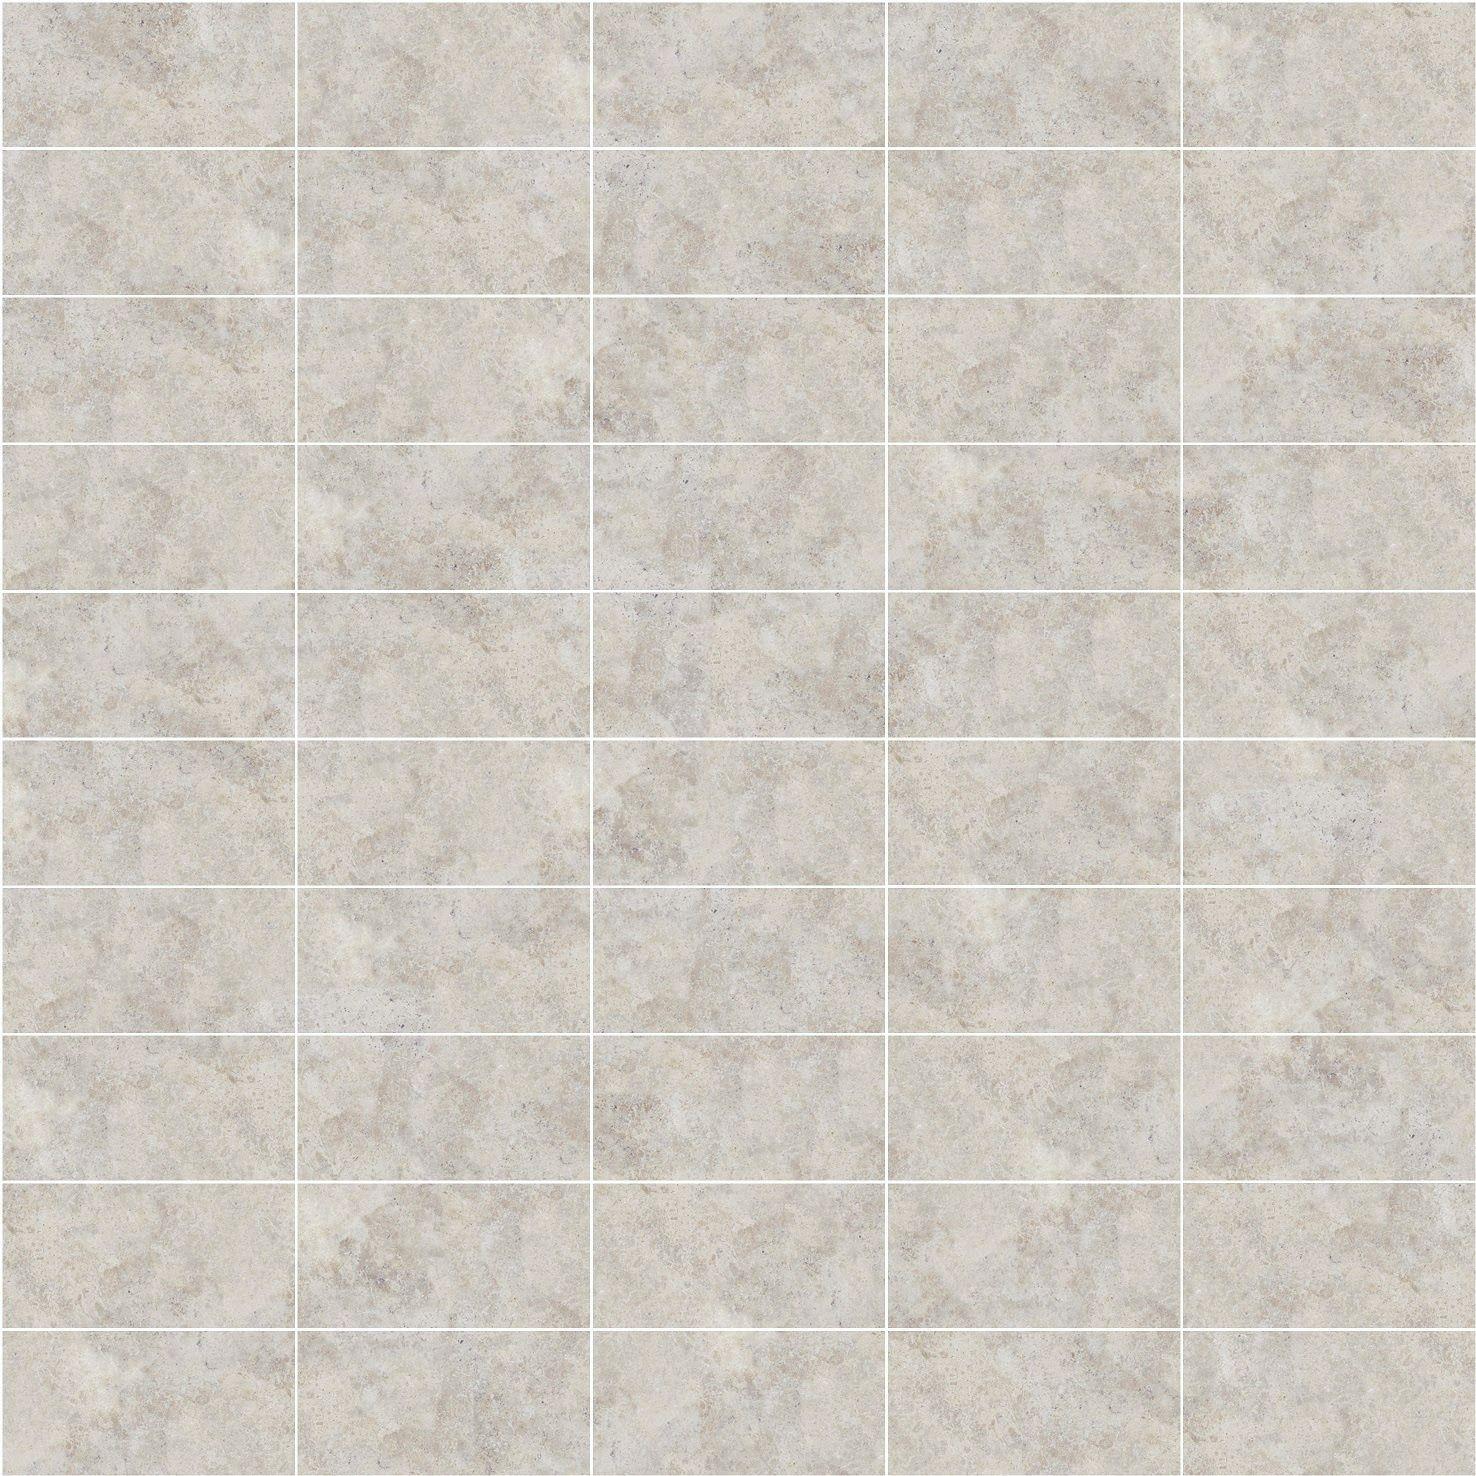 Ceramic Tile Texture Seamless Tiles